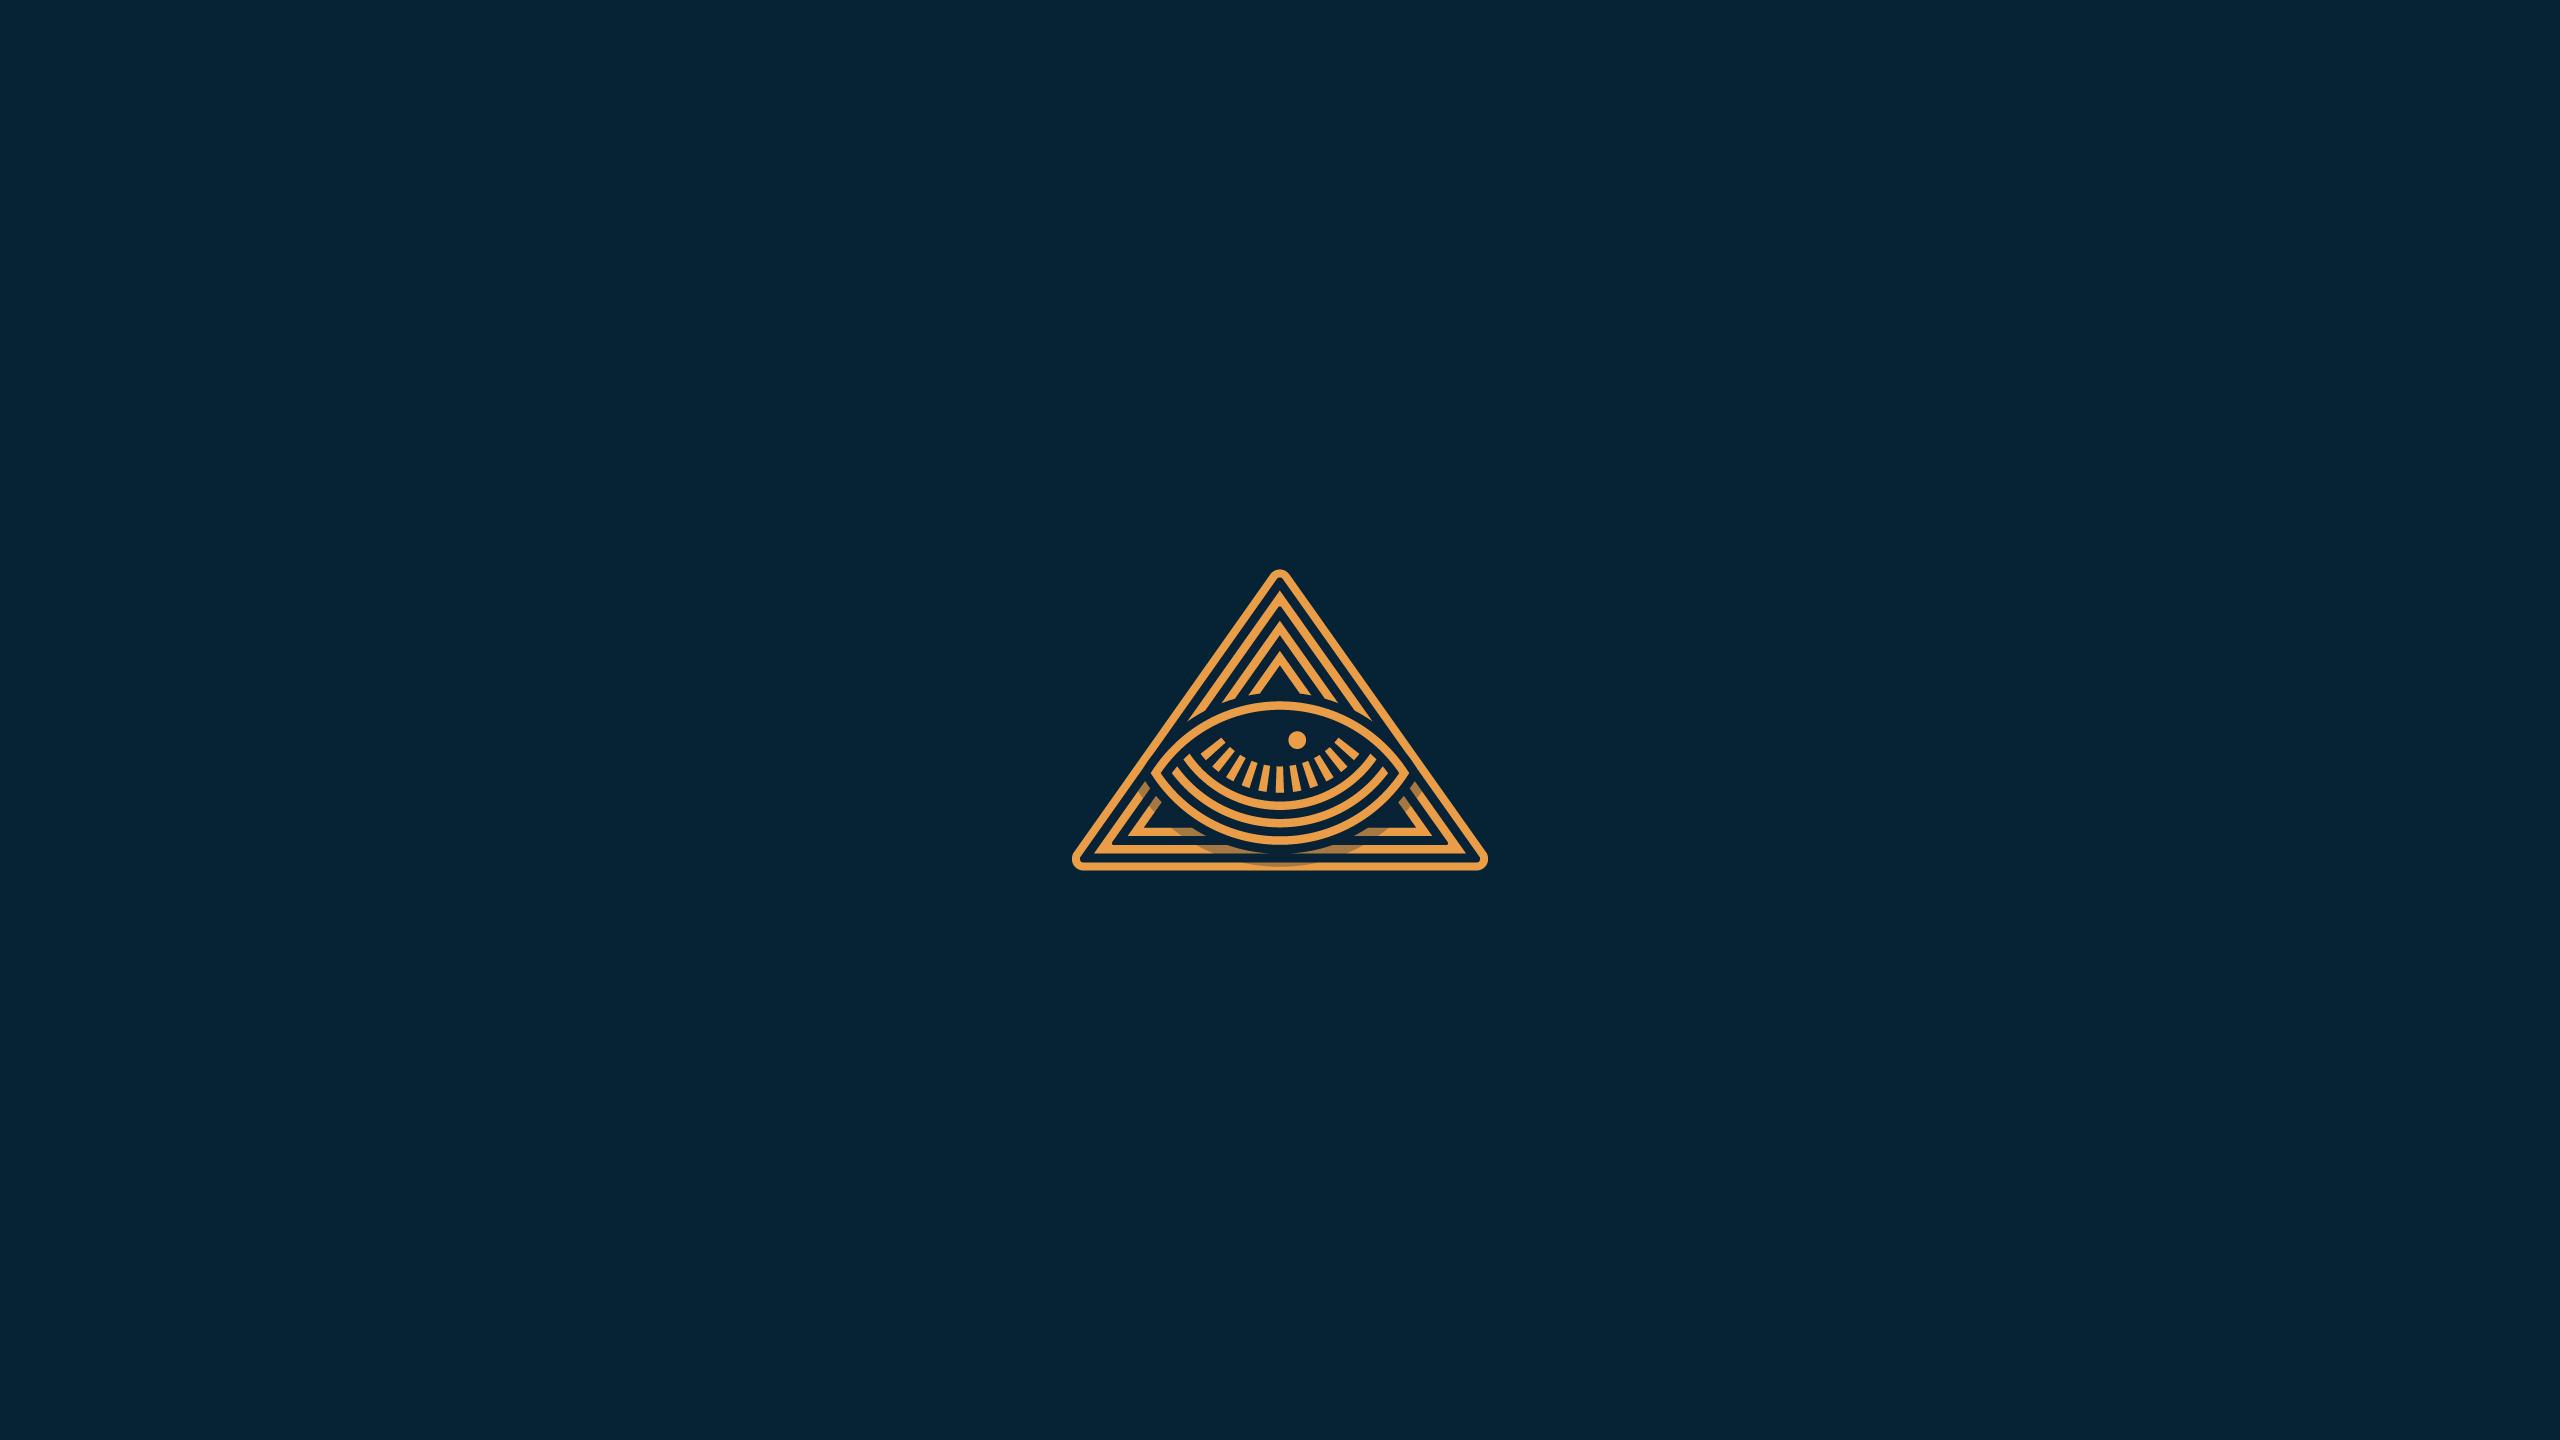 Graphic Design Blue Background Illuminati Pyramid The All Seeing Eye